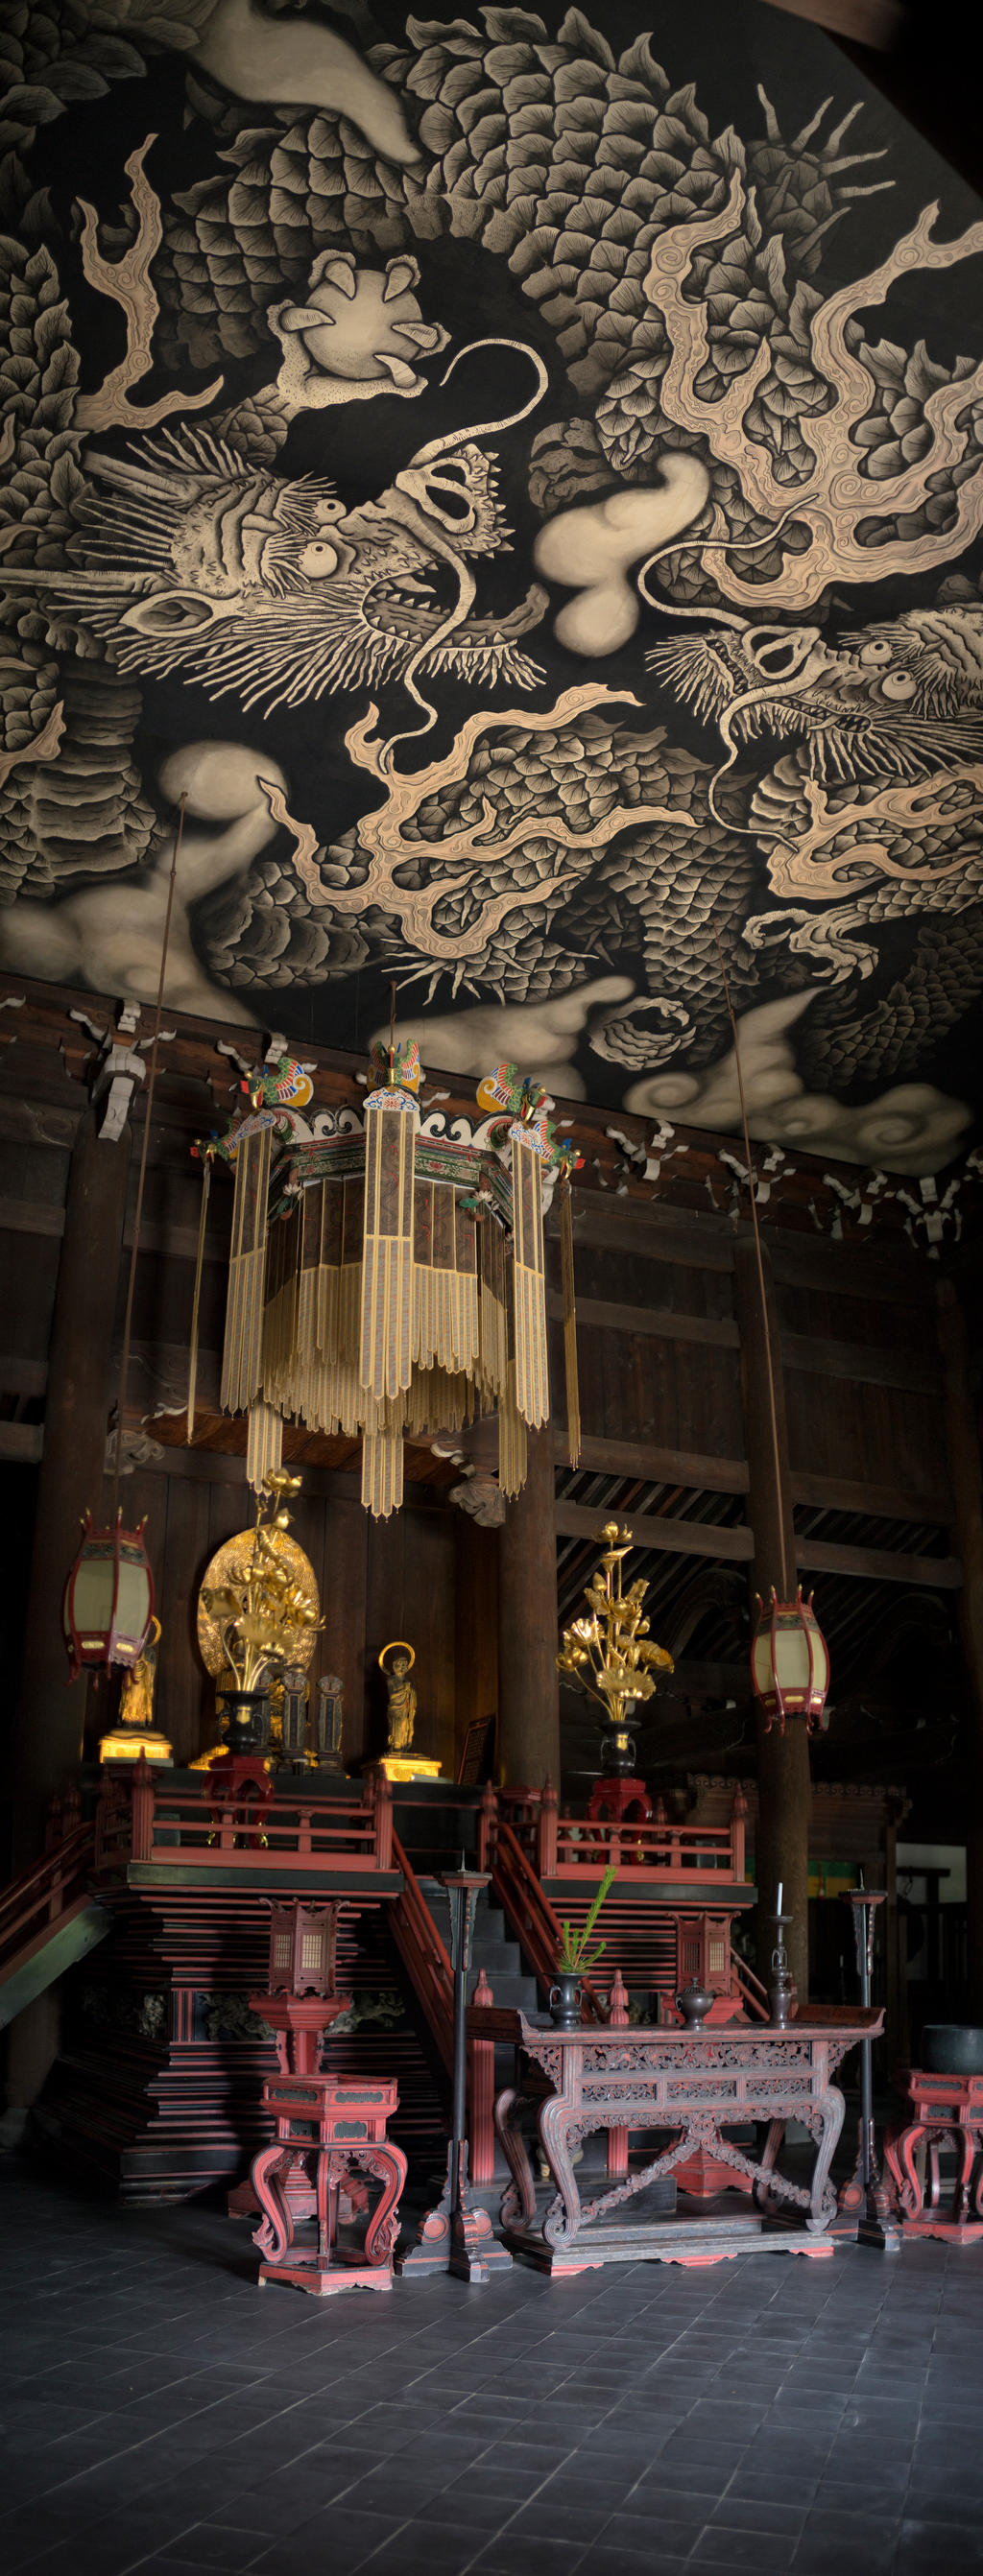 Twin Dragons Ceiling by 5bodyblade